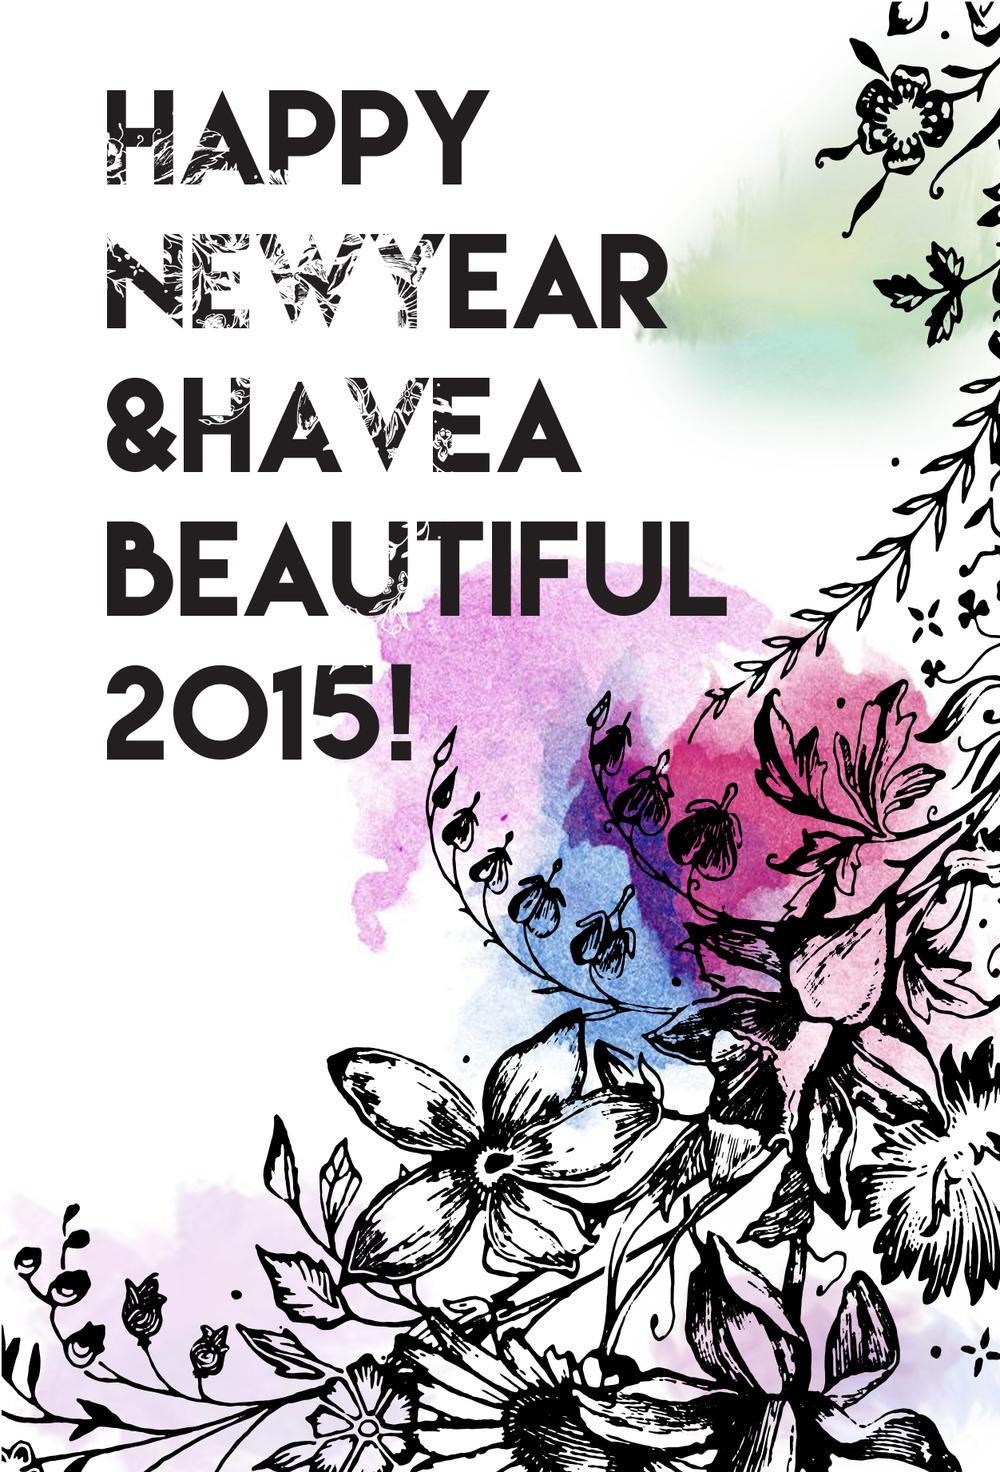 Happy Near Year from A.P Bloem Florist Amsterdam Bloemist